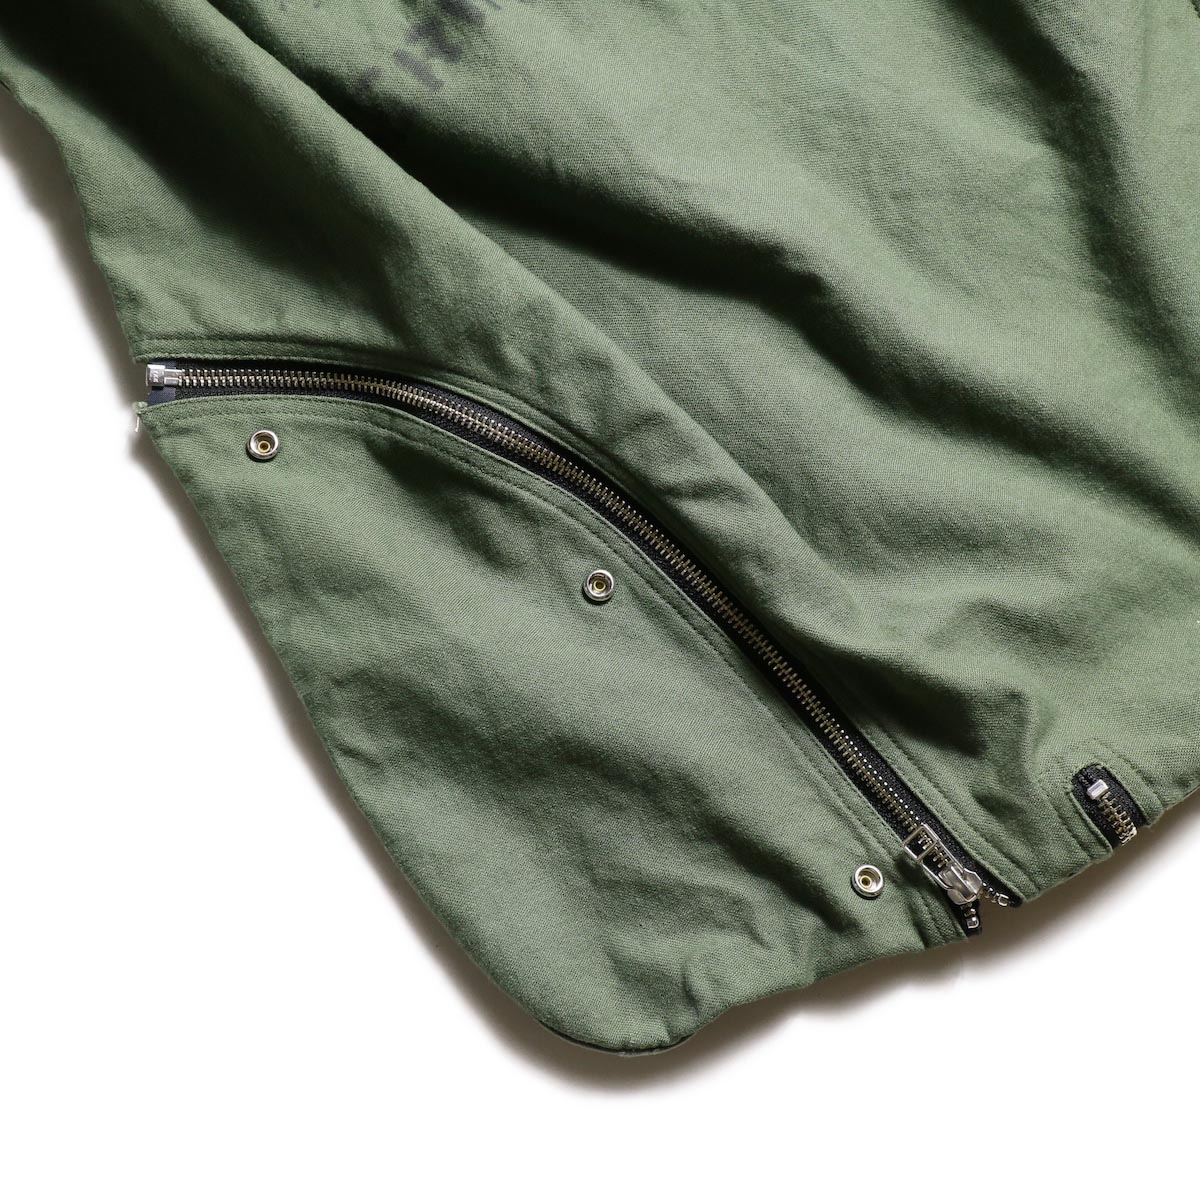 OLD PARK / LAUNDRY VEST BAG -Military zip